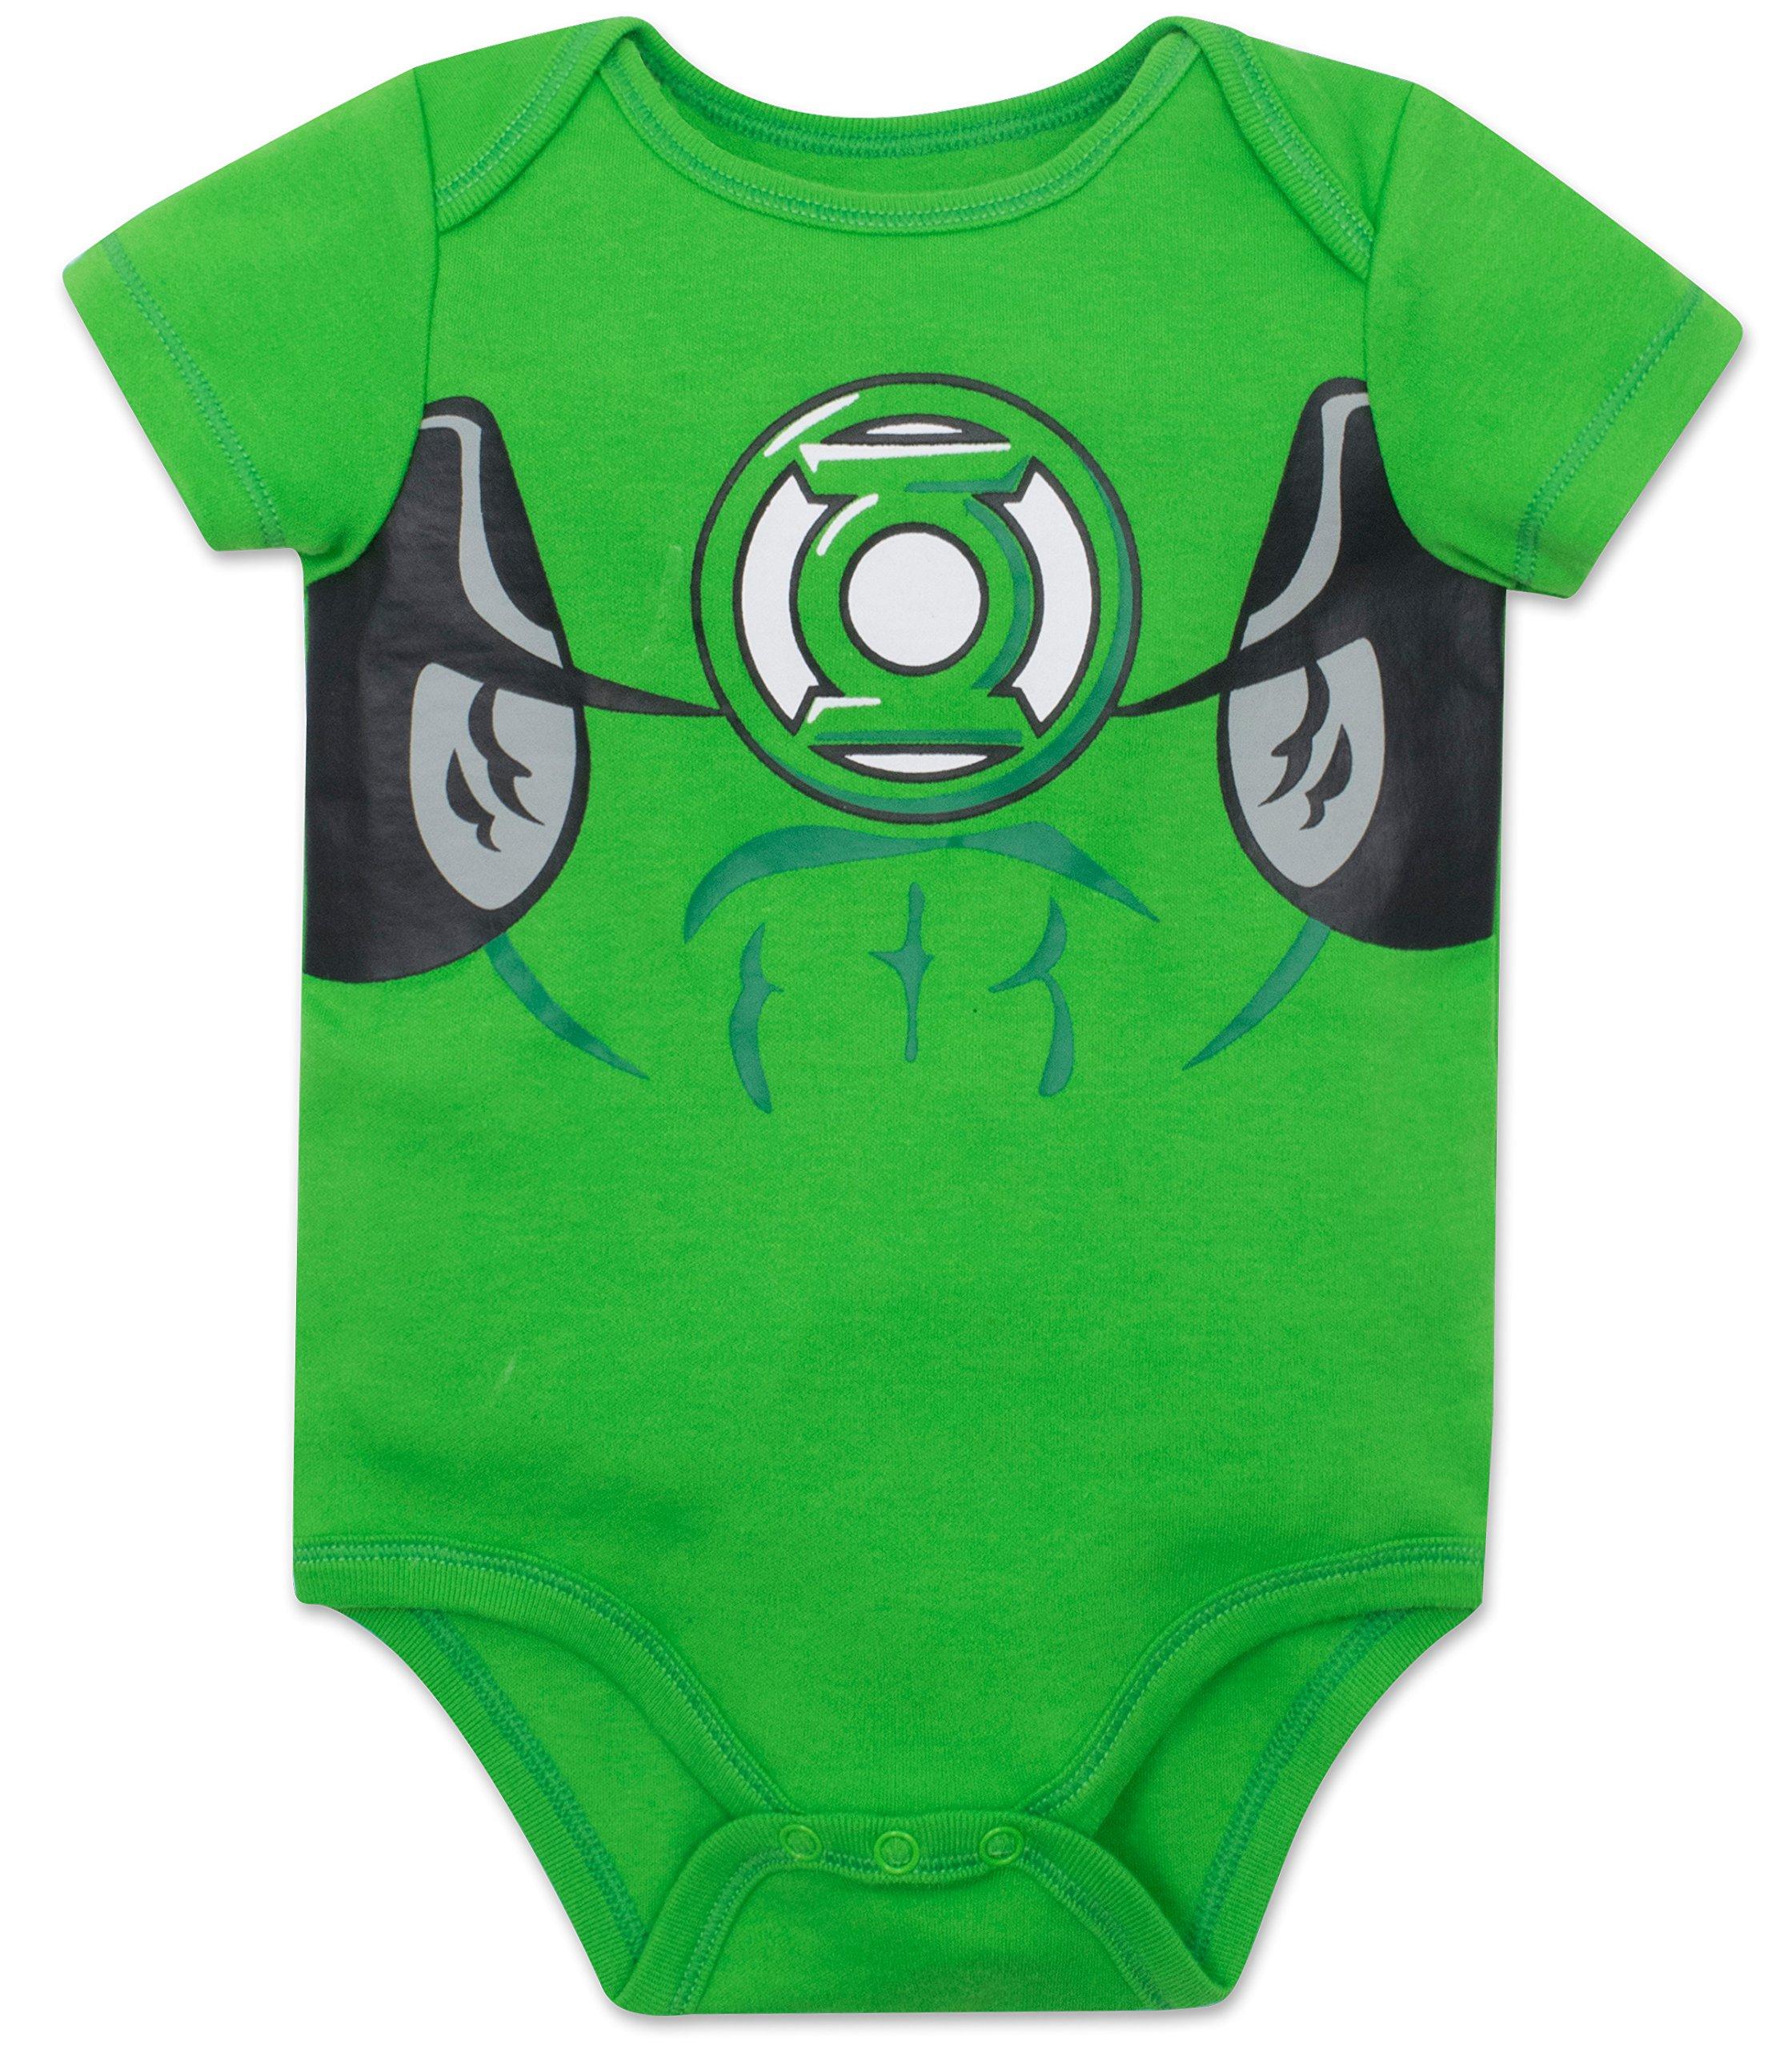 Justice League Baby Boys' 5 Pack Superhero Onesies - Batman, Superman, The Flash and Green Lantern (6-9M) by Warner Bros. (Image #2)